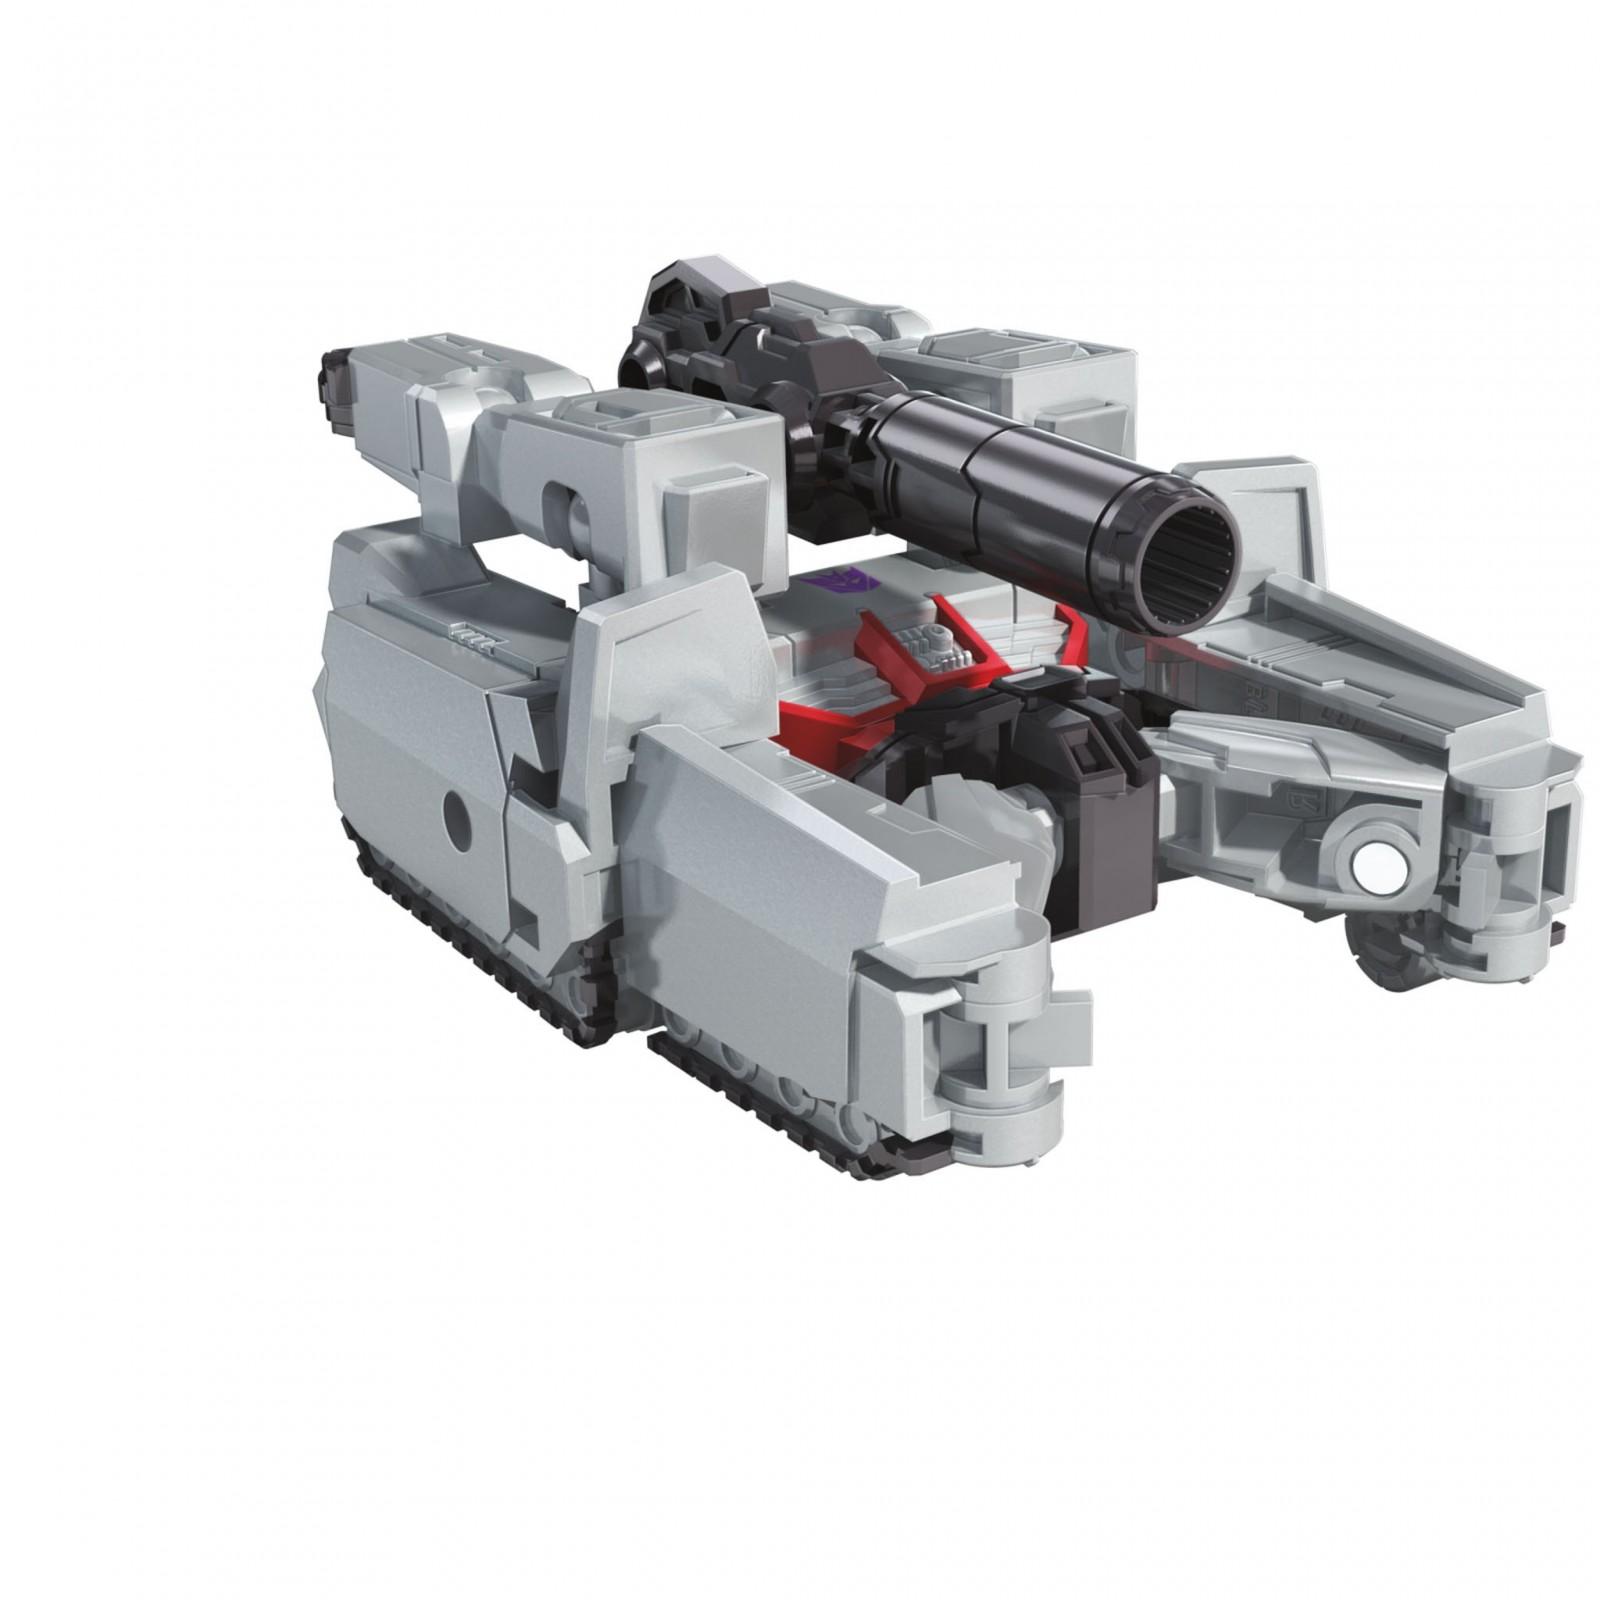 Transformers News: Transformers Cyberverse Spark Armor Toys Revealed